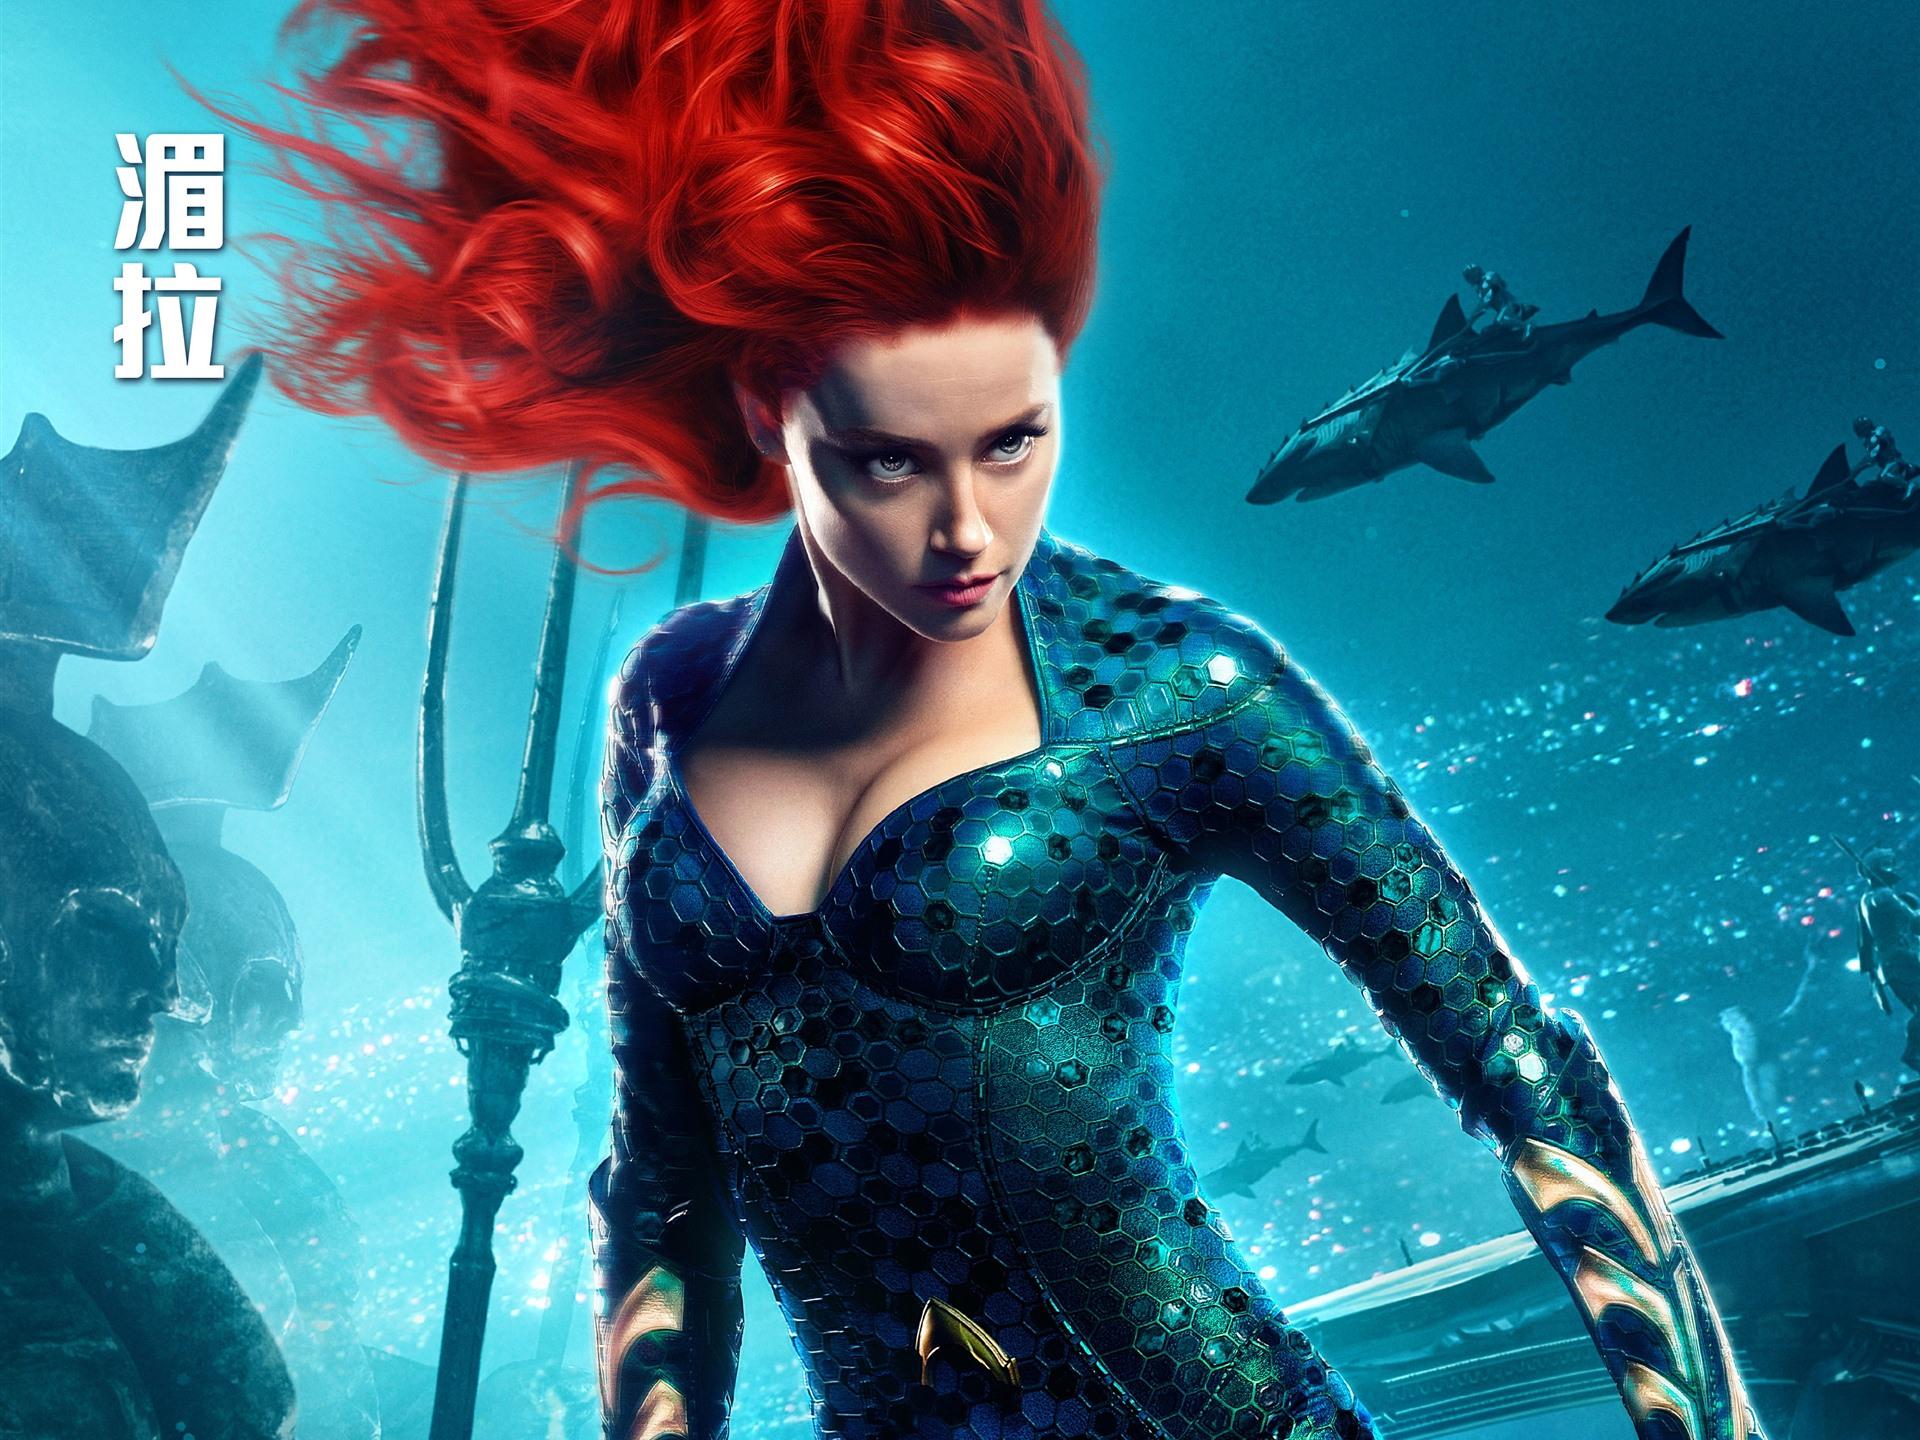 Movie Poster 2019: Amber Heard, Mera, Aquaman 2018 1242x2688 IPhone XS Max